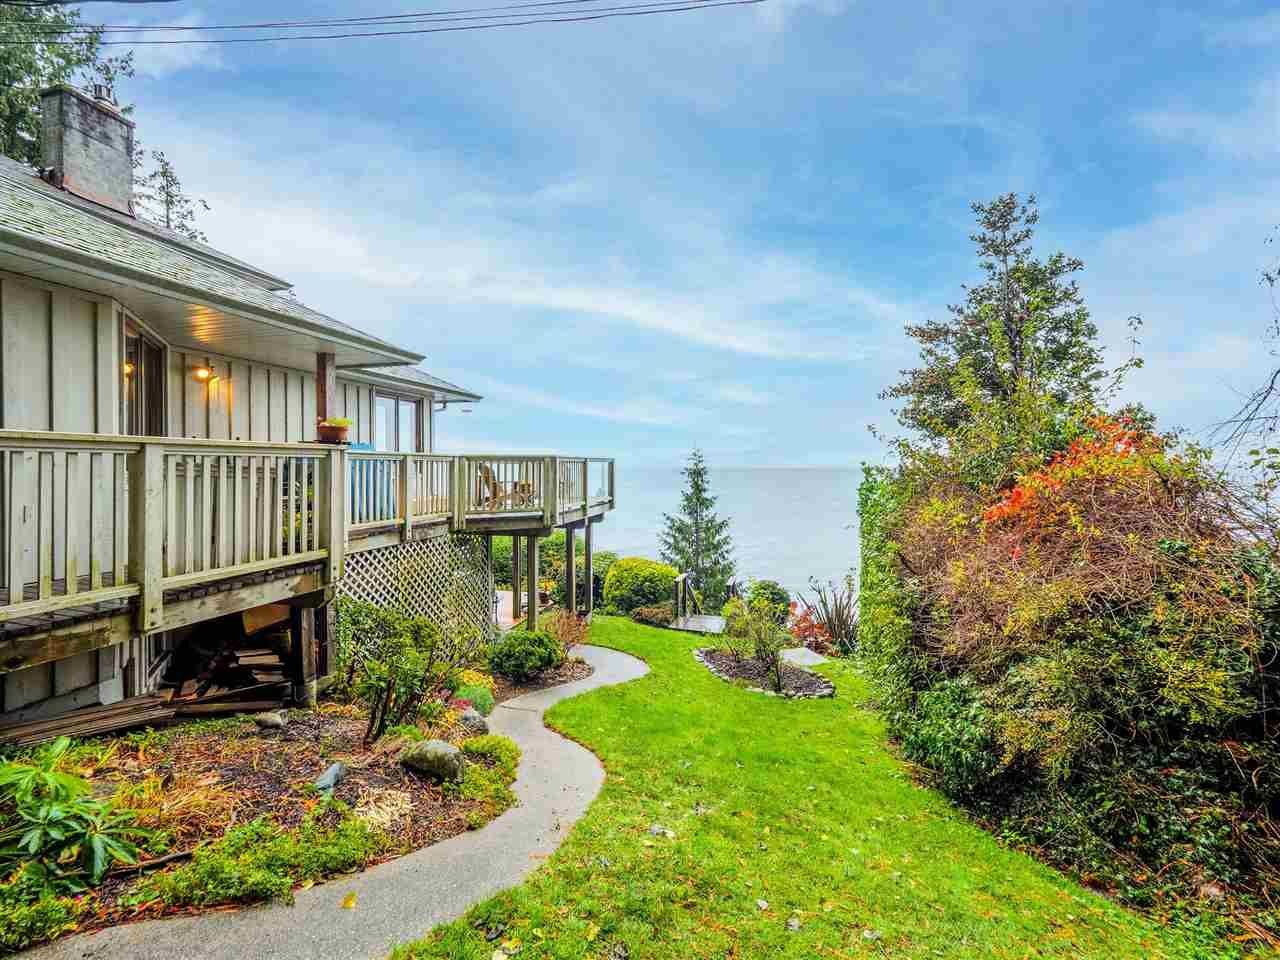 Main Photo: 3427 BEACH Avenue: Roberts Creek House for sale (Sunshine Coast)  : MLS®# R2519025